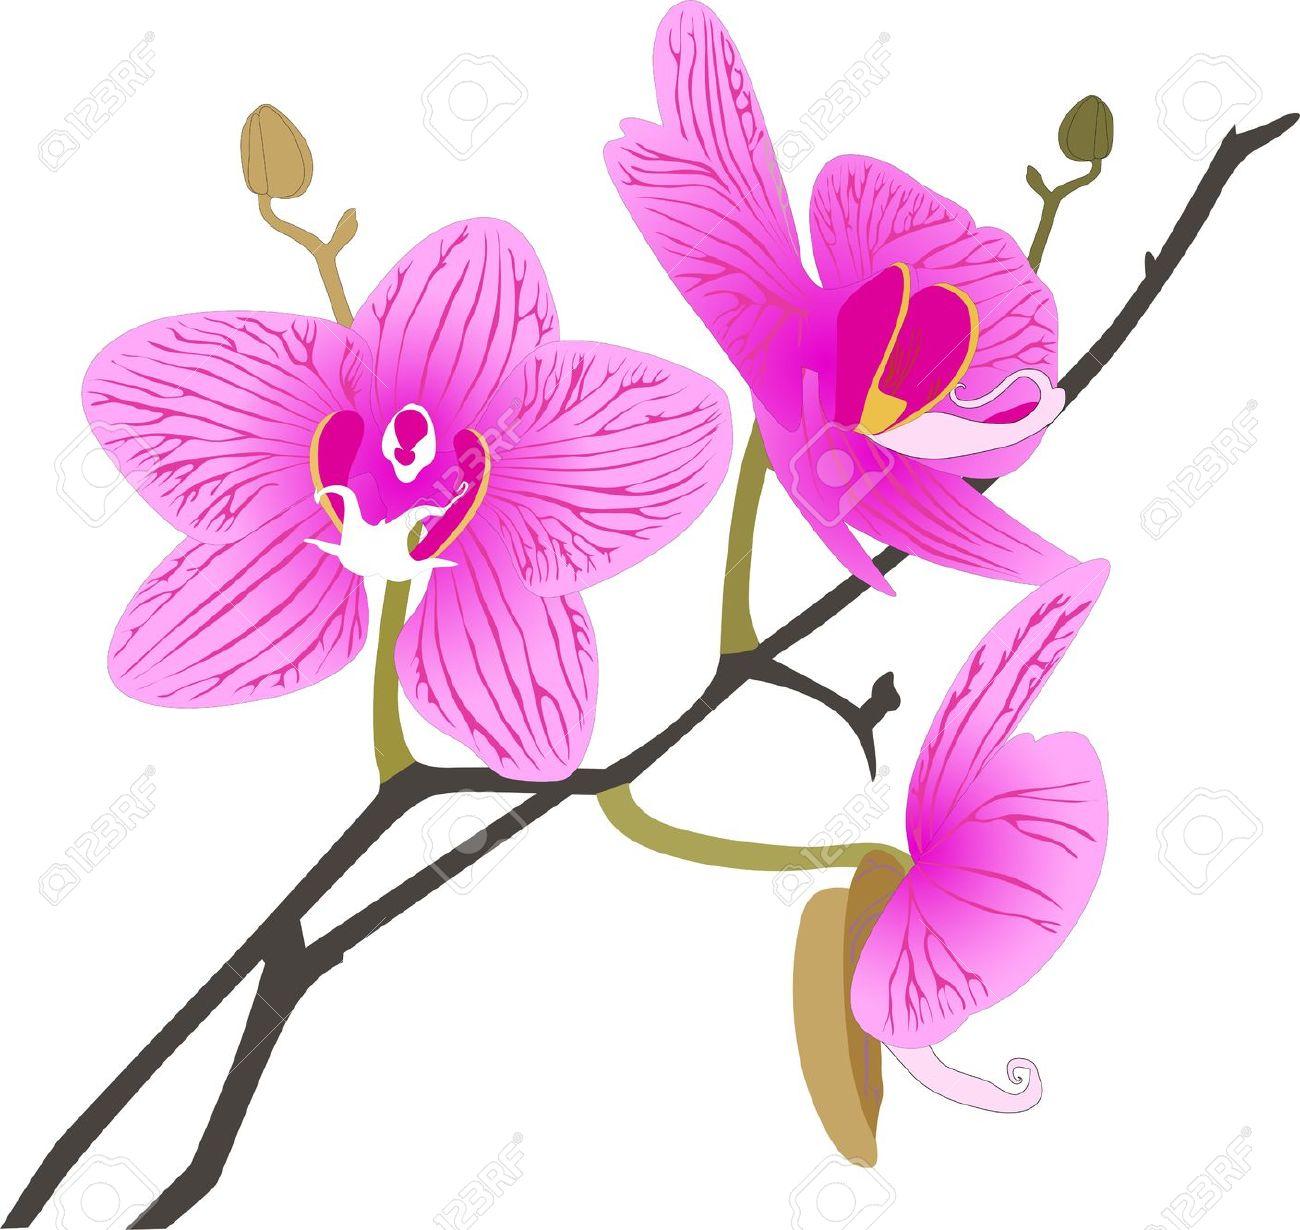 orchid flower clip art #10.